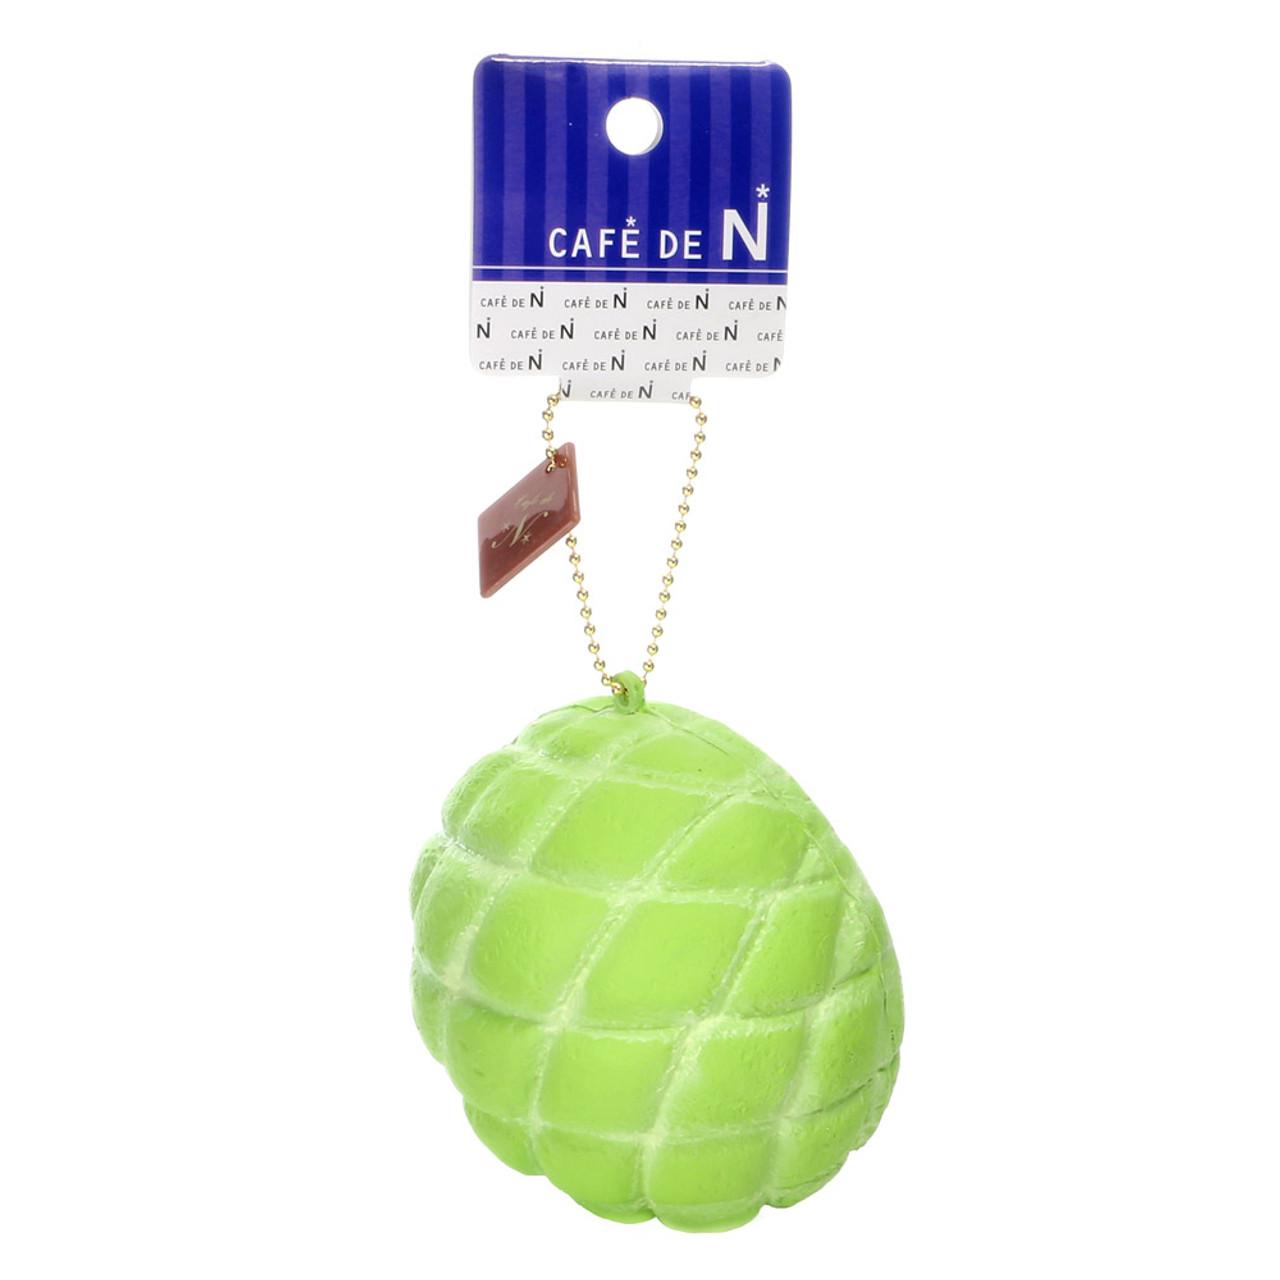 Café De N Green Cantaloupe Melonpan Squishy Toys Charms ( Tag View )